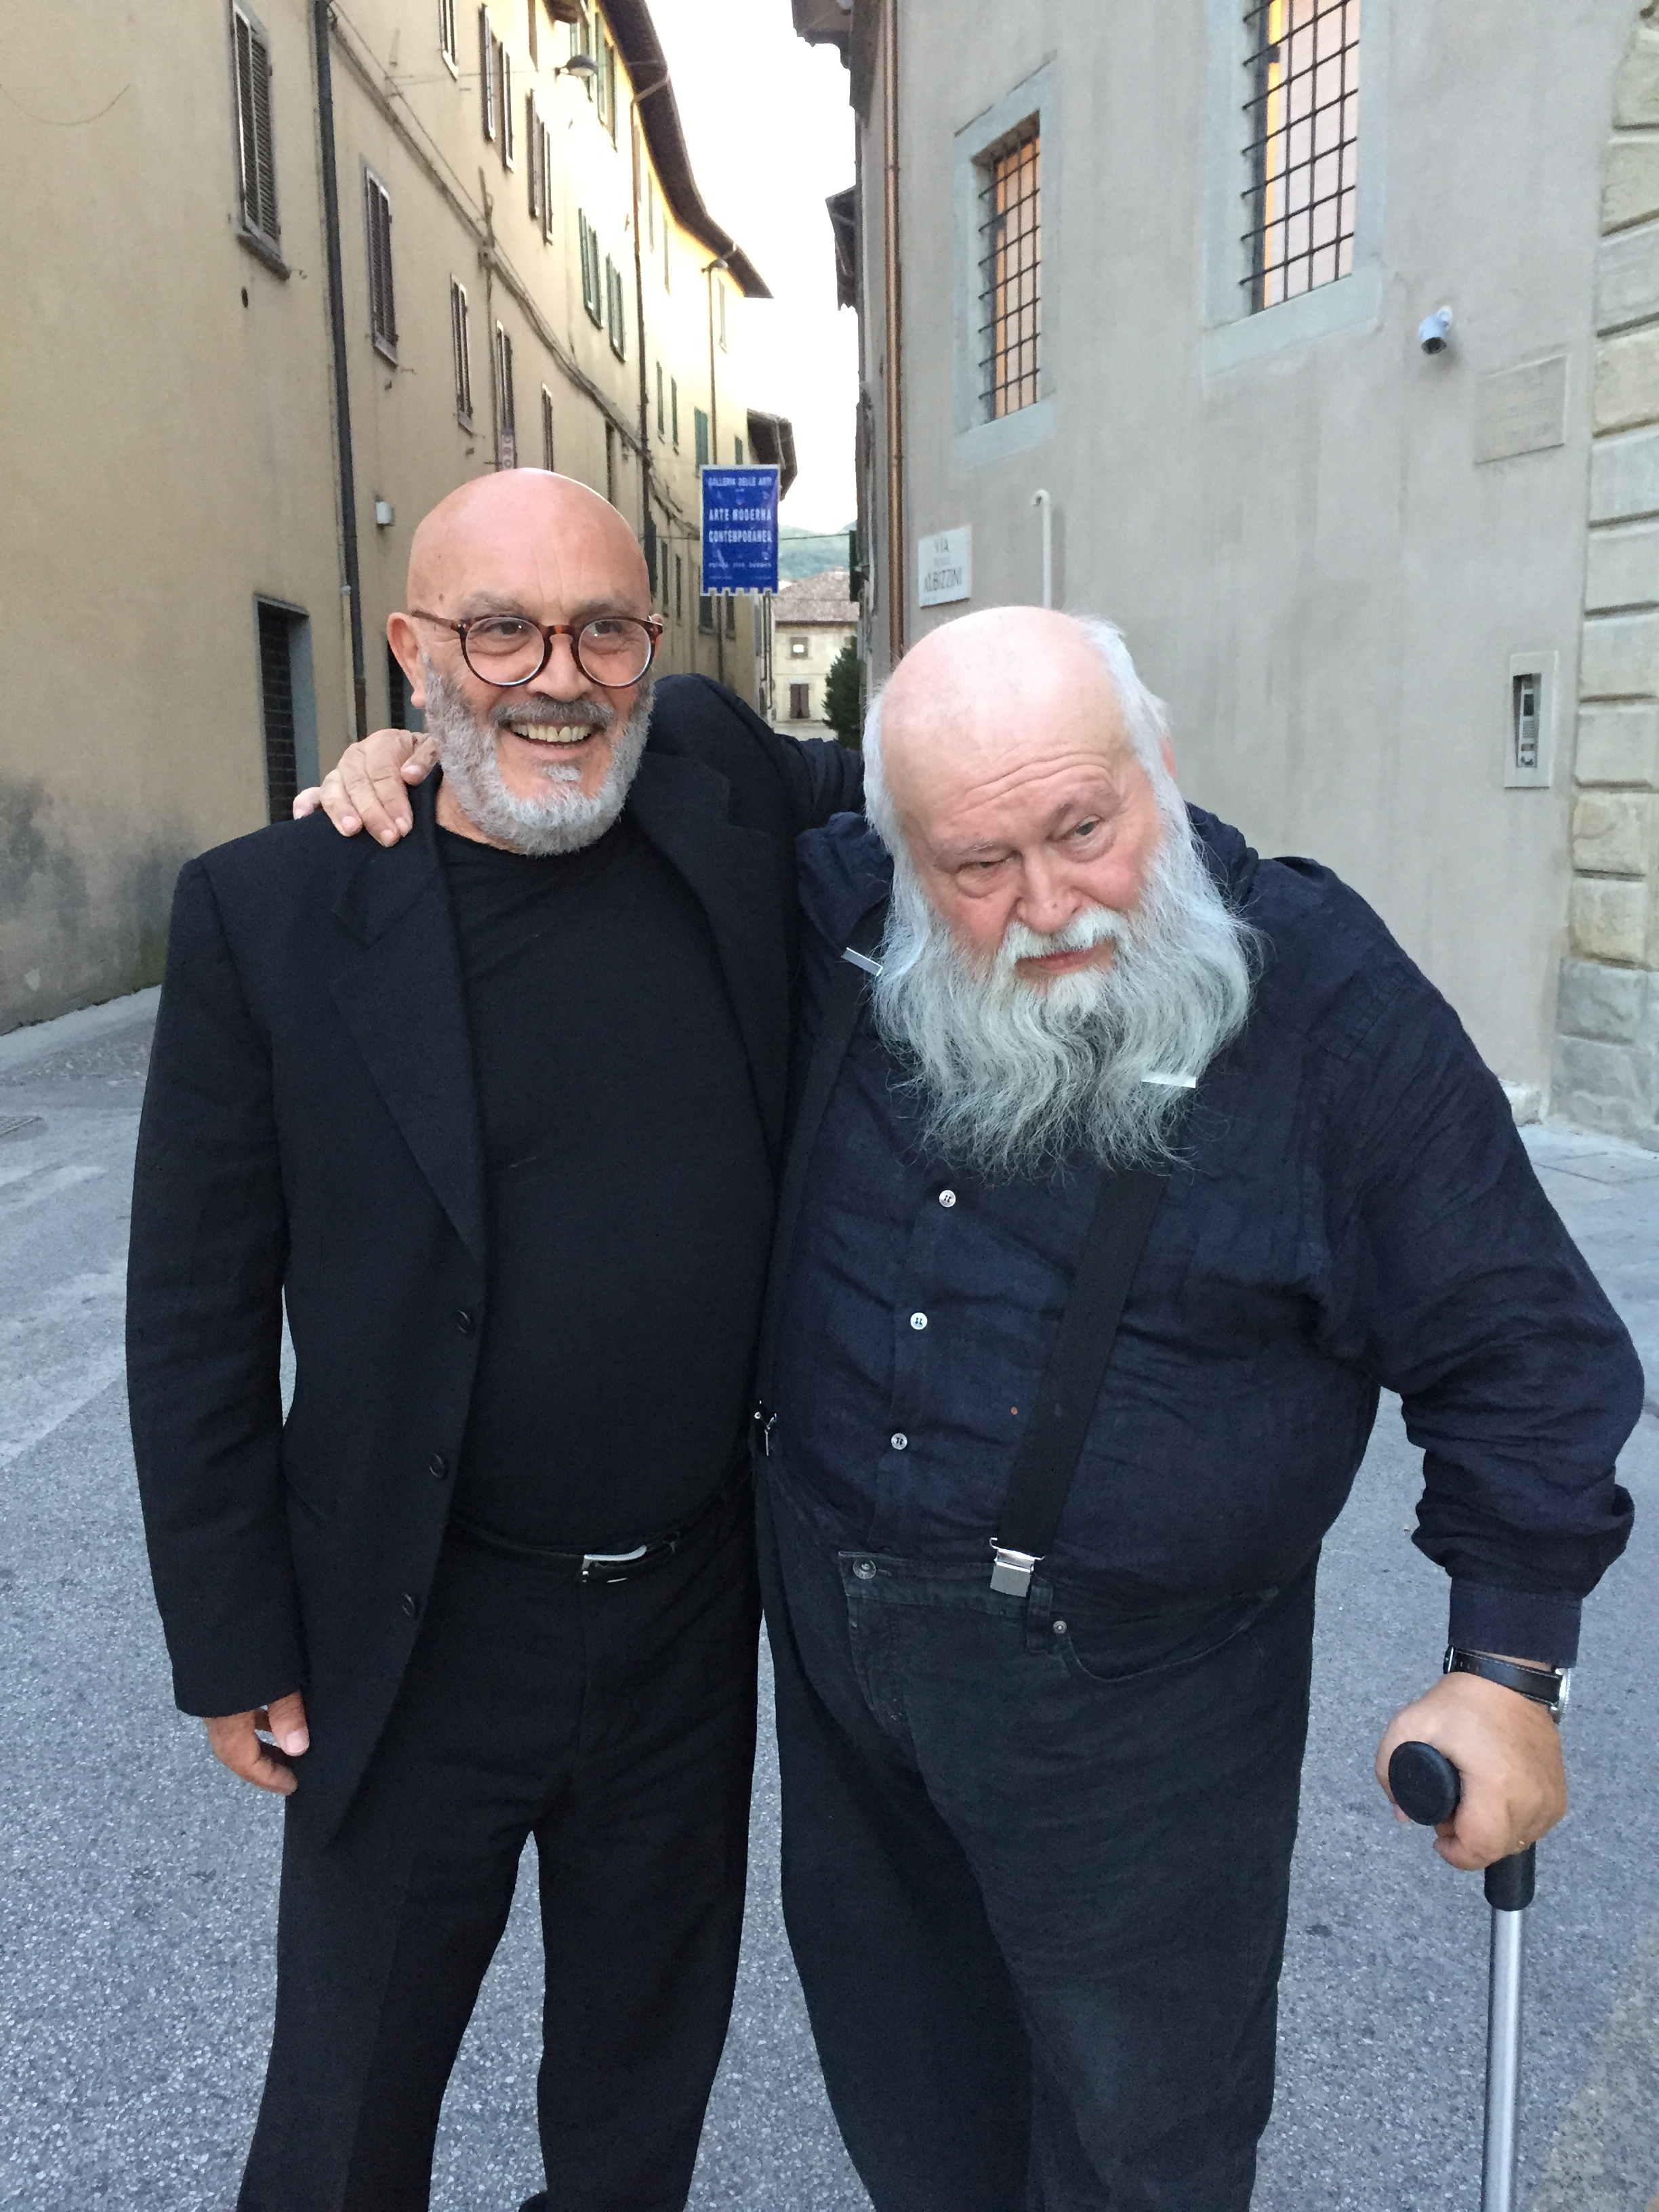 Peppe Morra con Hermann Nitsch